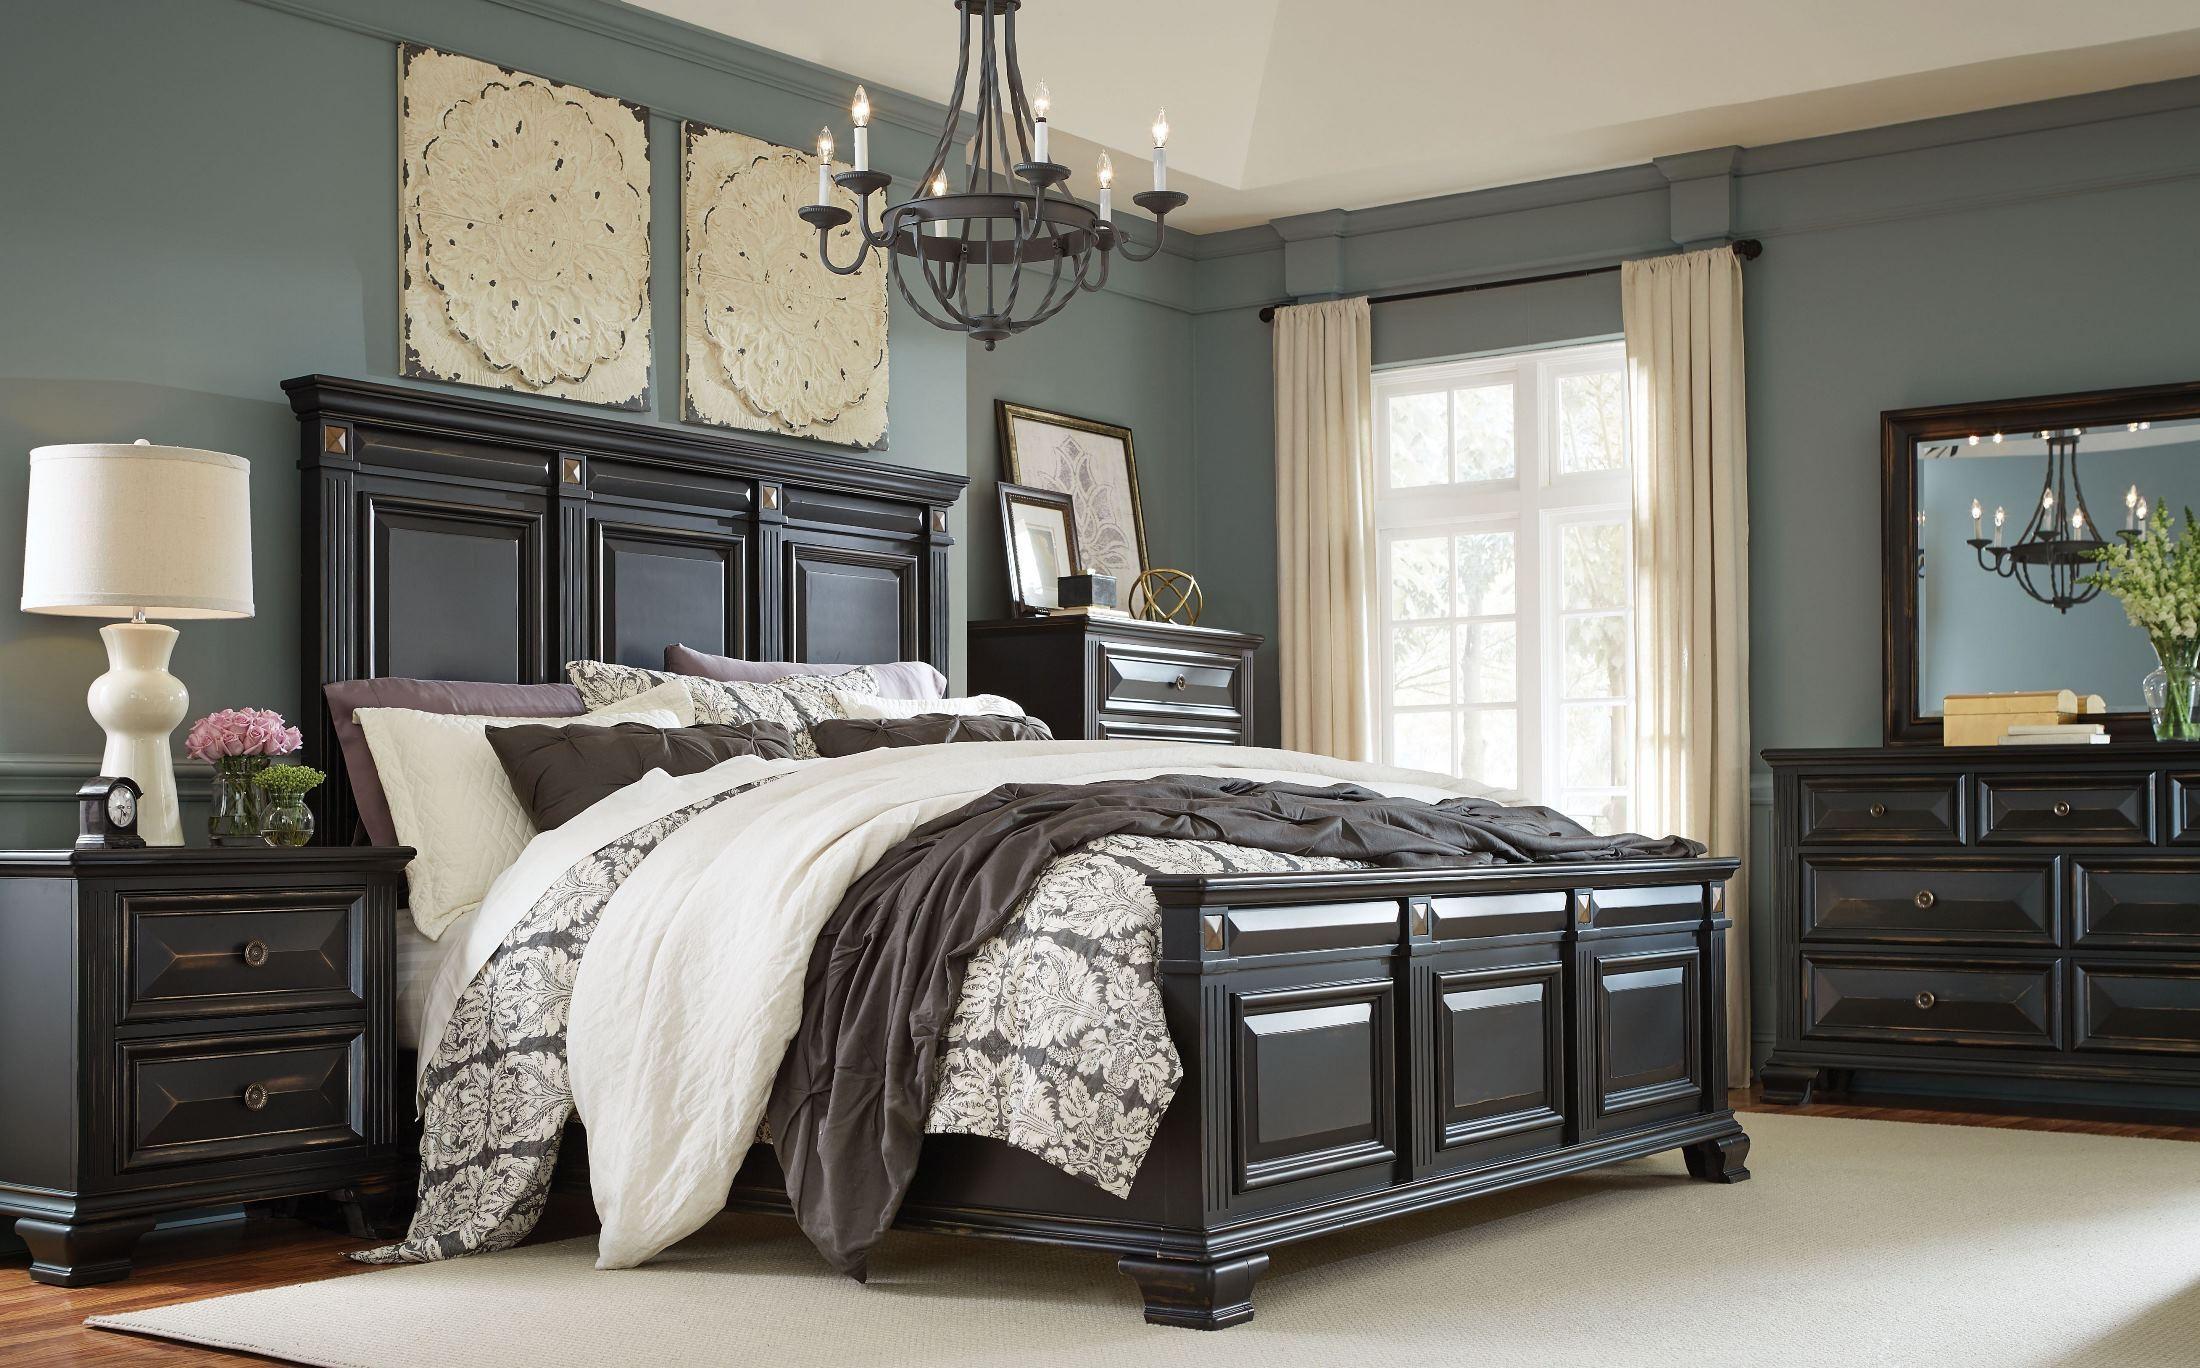 Best ideas about Black Bedroom Set . Save or Pin Passages Vintage Black Panel Bedroom Set from Standard Now.